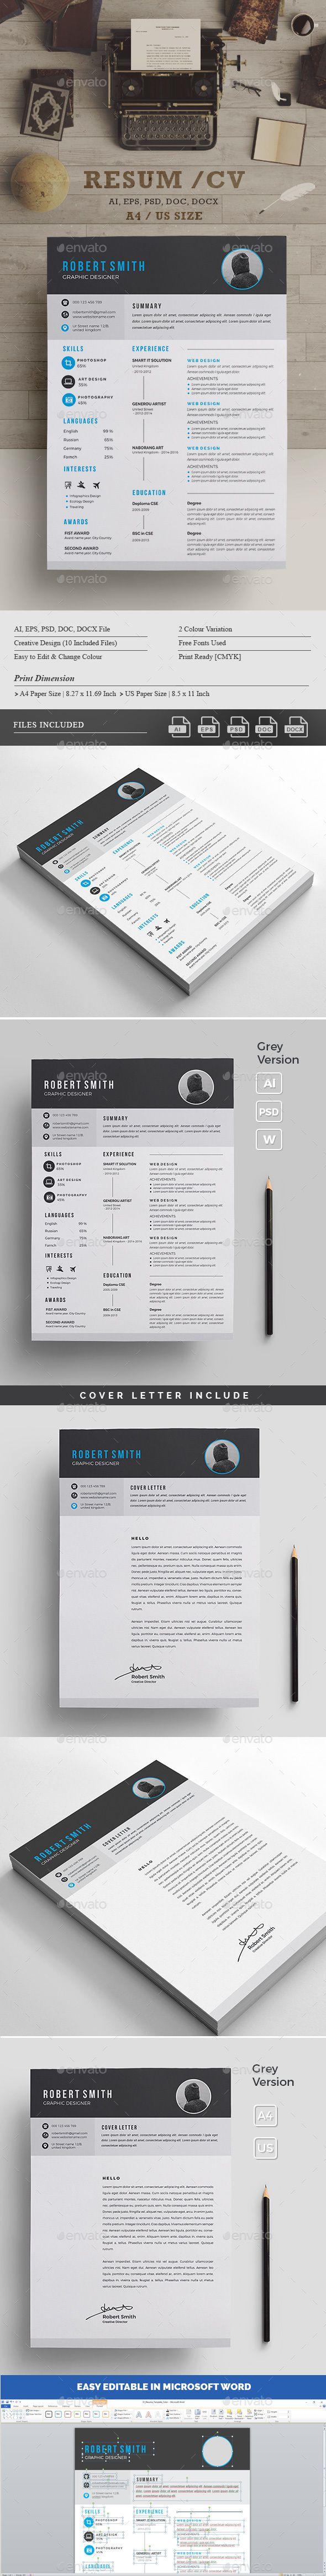 #Resume/CV - #Resumes #Stationery Download here: https://graphicriver.net/item/resumecv/19182084?ref=alena994